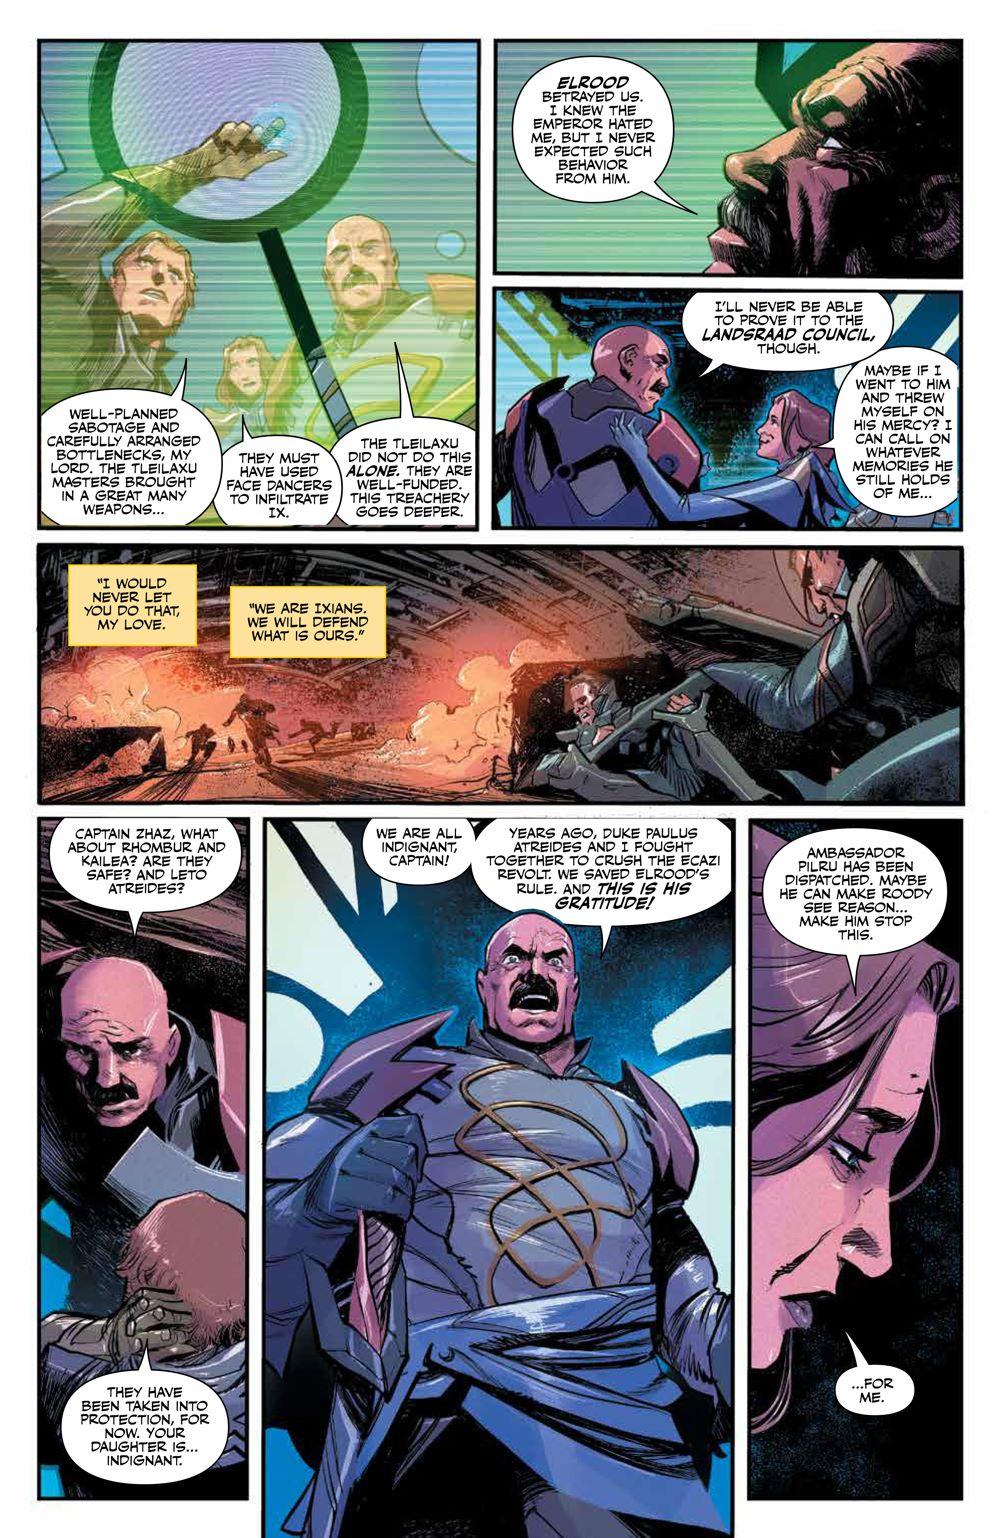 Dune_HouseAtreides_006_PRESS_4 ComicList Previews: DUNE HOUSE ATREIDES #6 (OF 12)